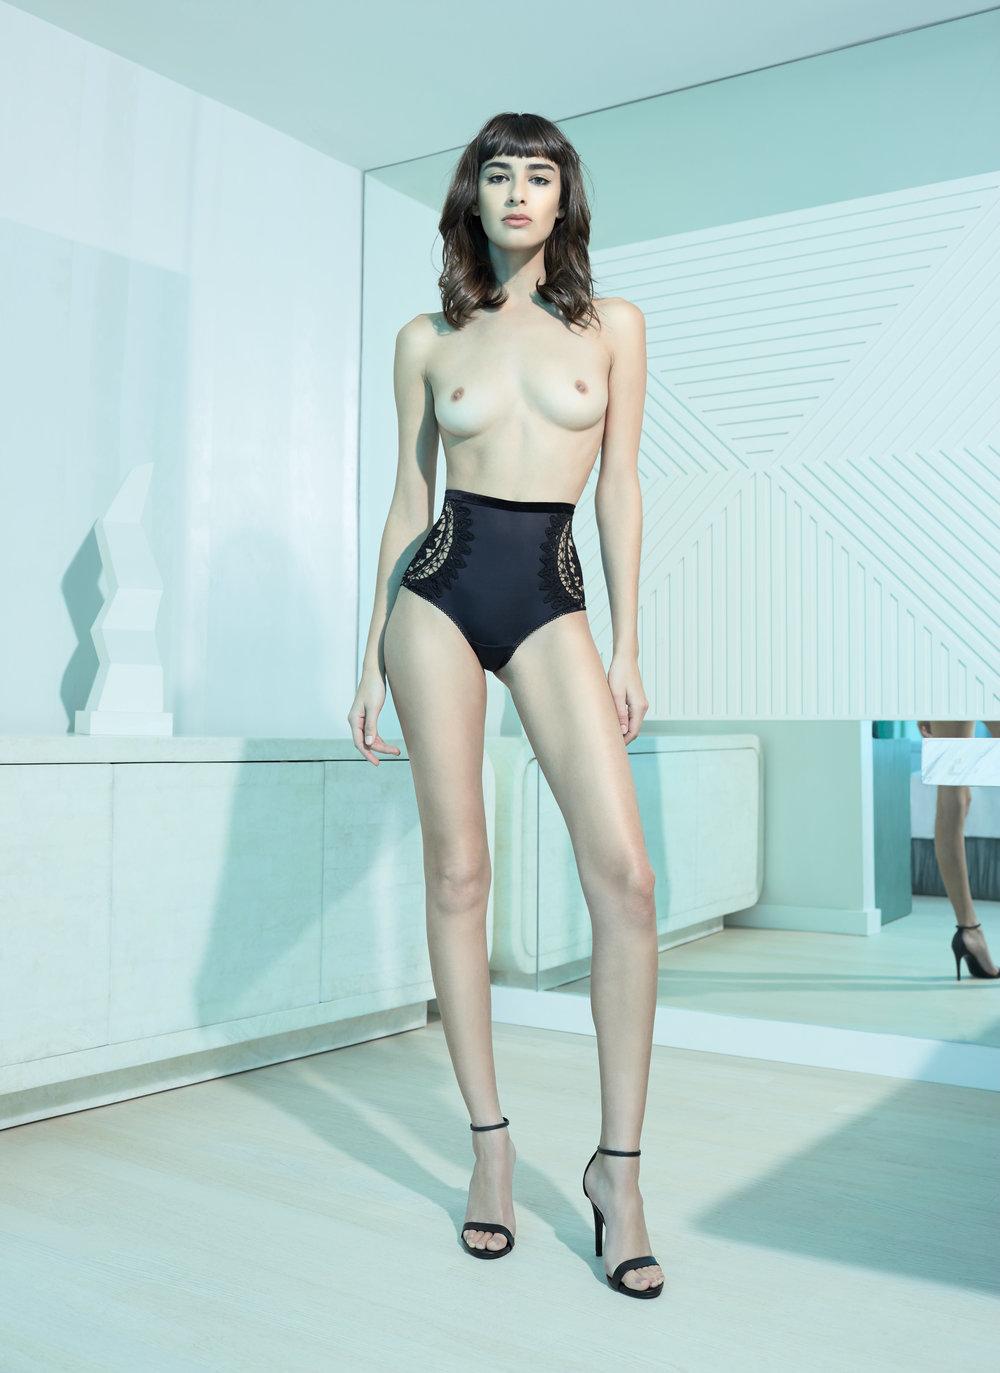 la-perla-fashion-josepie-zenati-scultpture-architecture-design-beauty-photographer-advertising-photography-stan-musilek